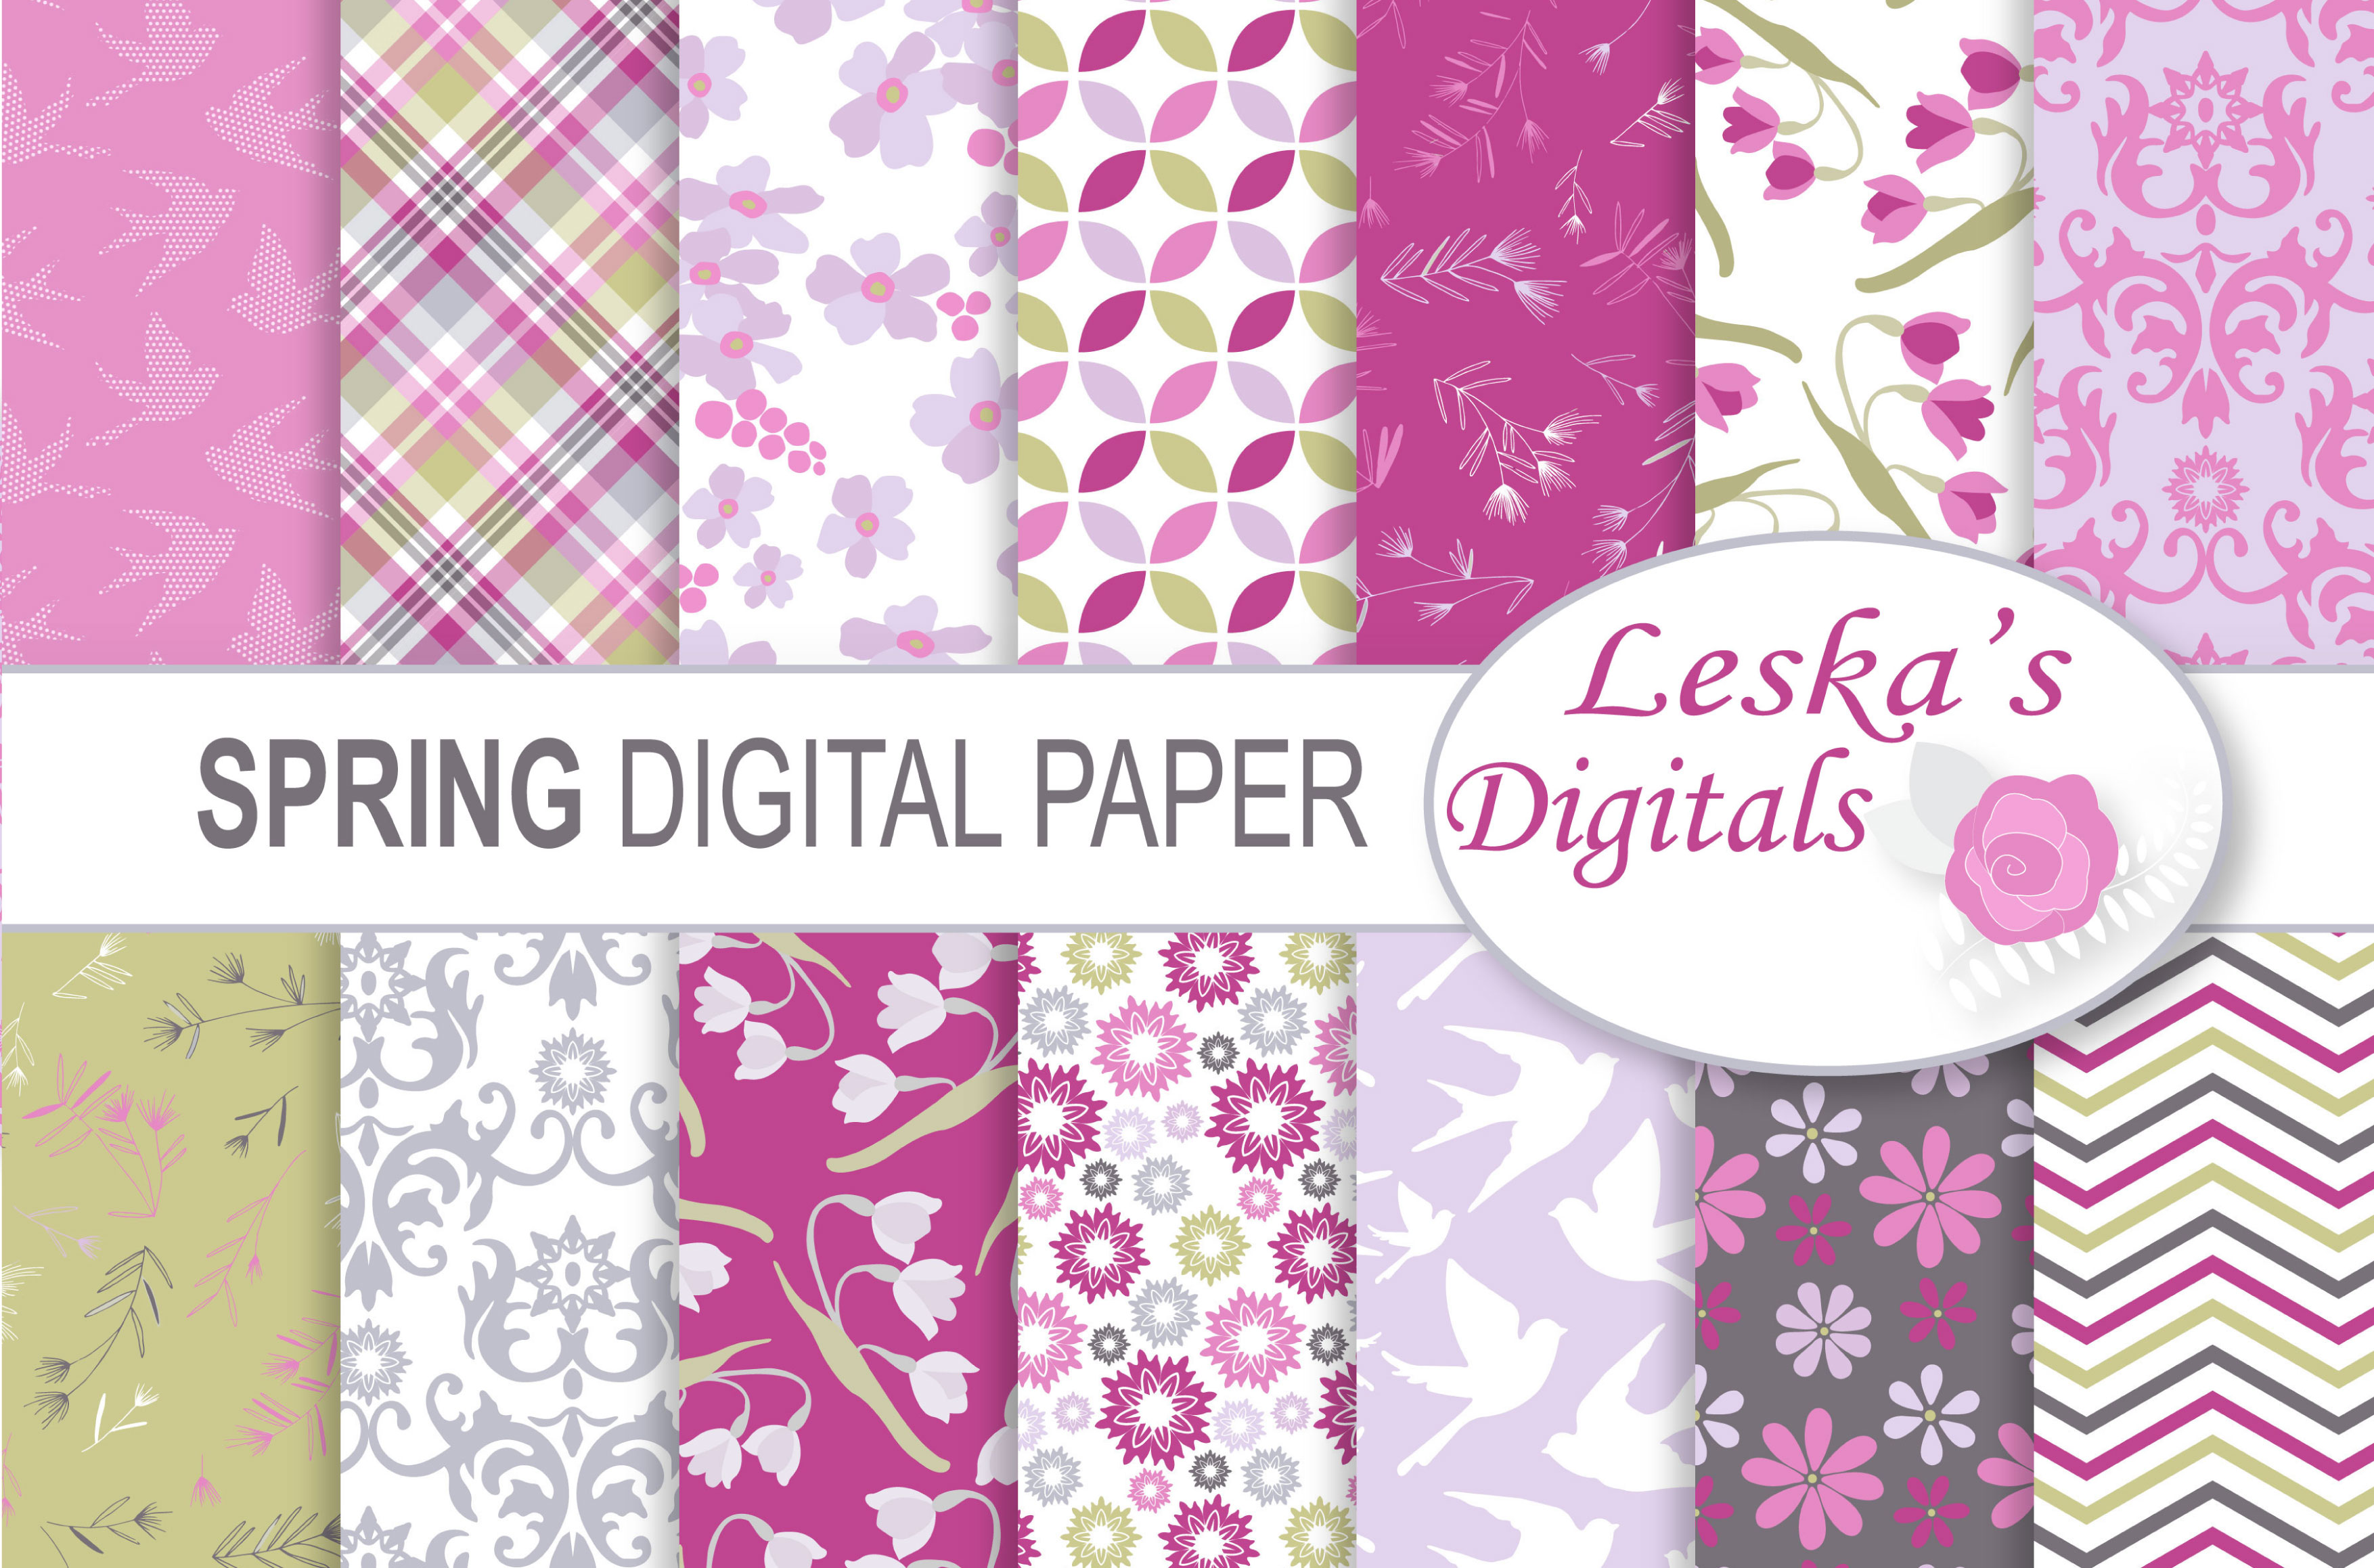 Spring Digital Paper Pack example image 1